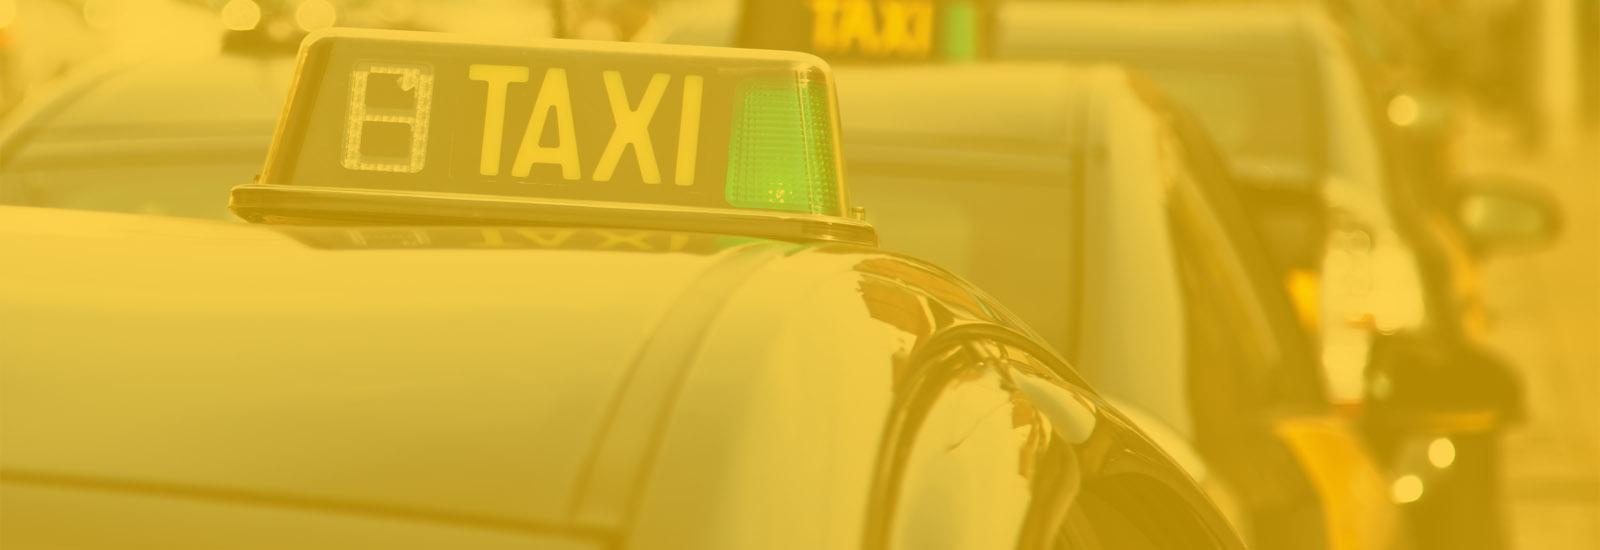 Taxi Barcelona 033